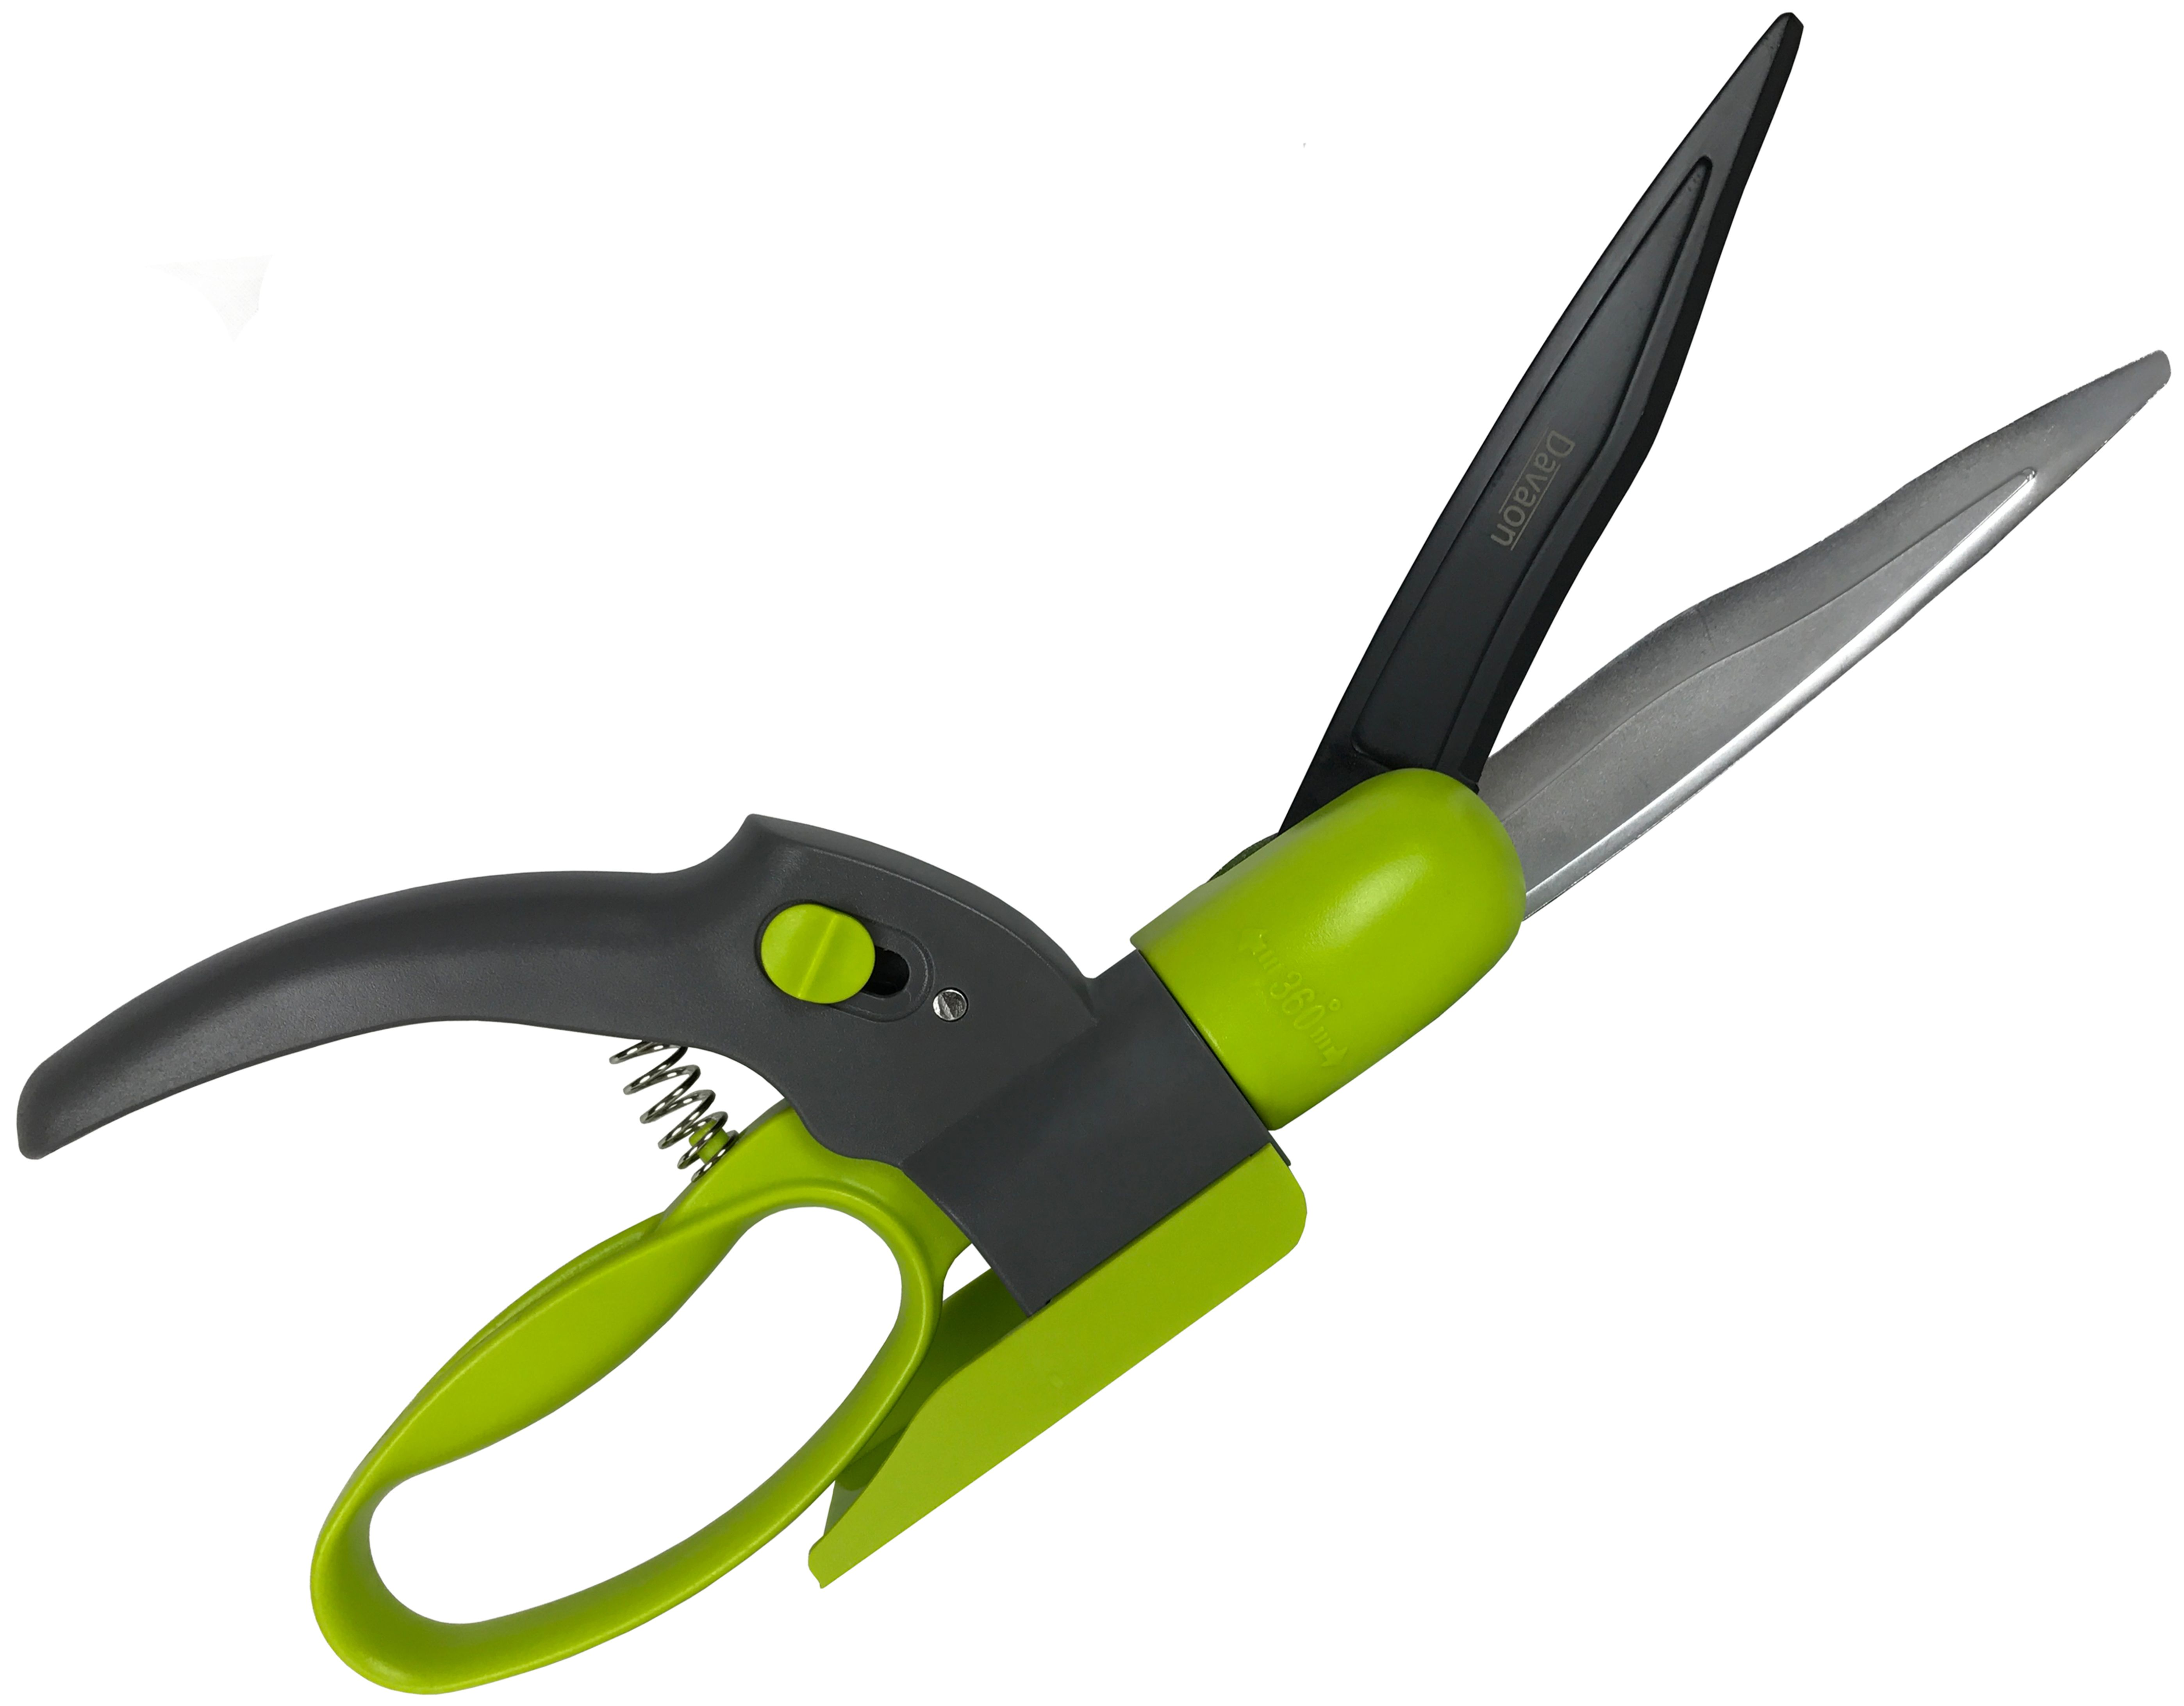 Davaon Pro Swivel Handy Garden Shears 13 99 Amazon Uk Christmas Gift Deal 360 Multi Angle Sharp For Perfecting Hedges Garden Shears Garden Tools Shears